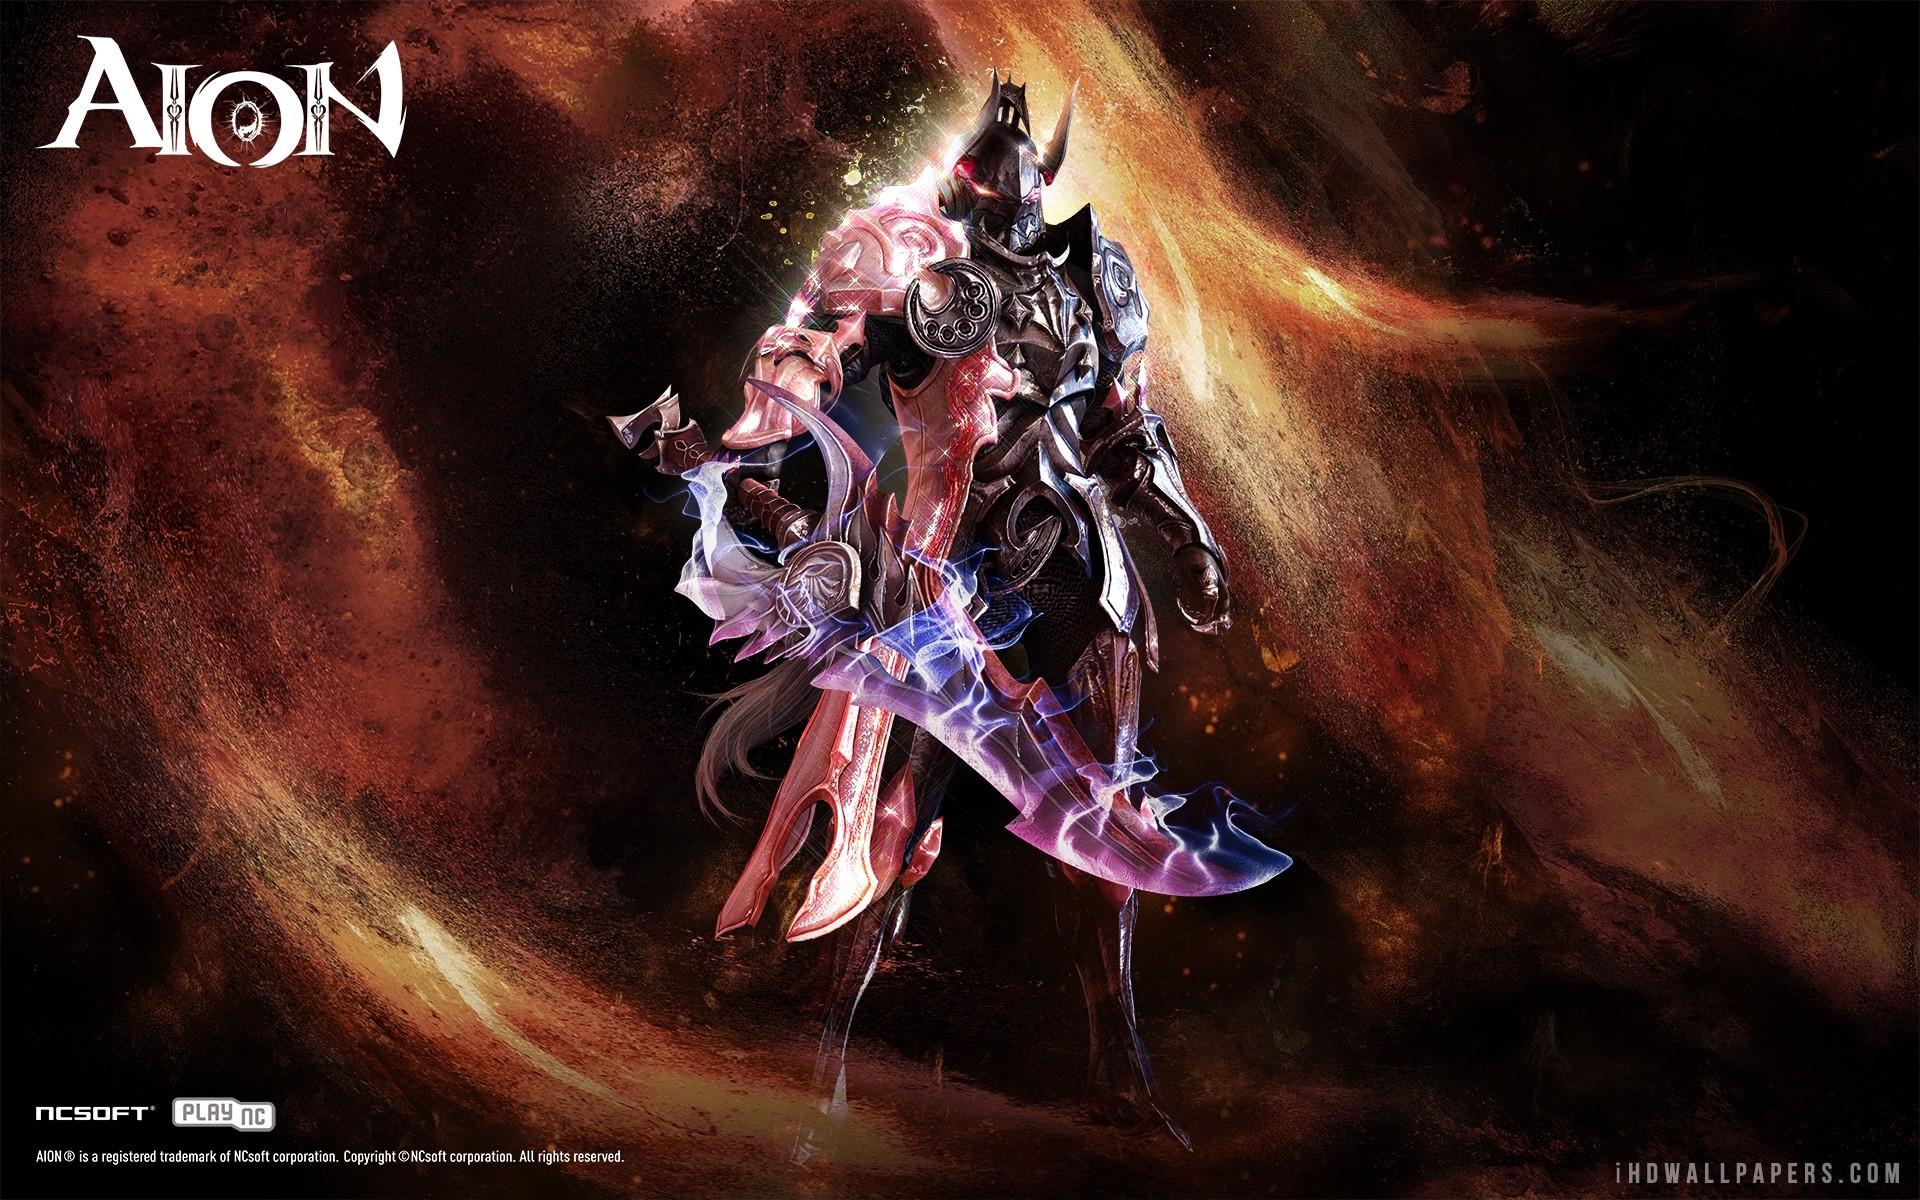 Aion 4 Gladiator HD Wallpaper – iHD Wallpapers